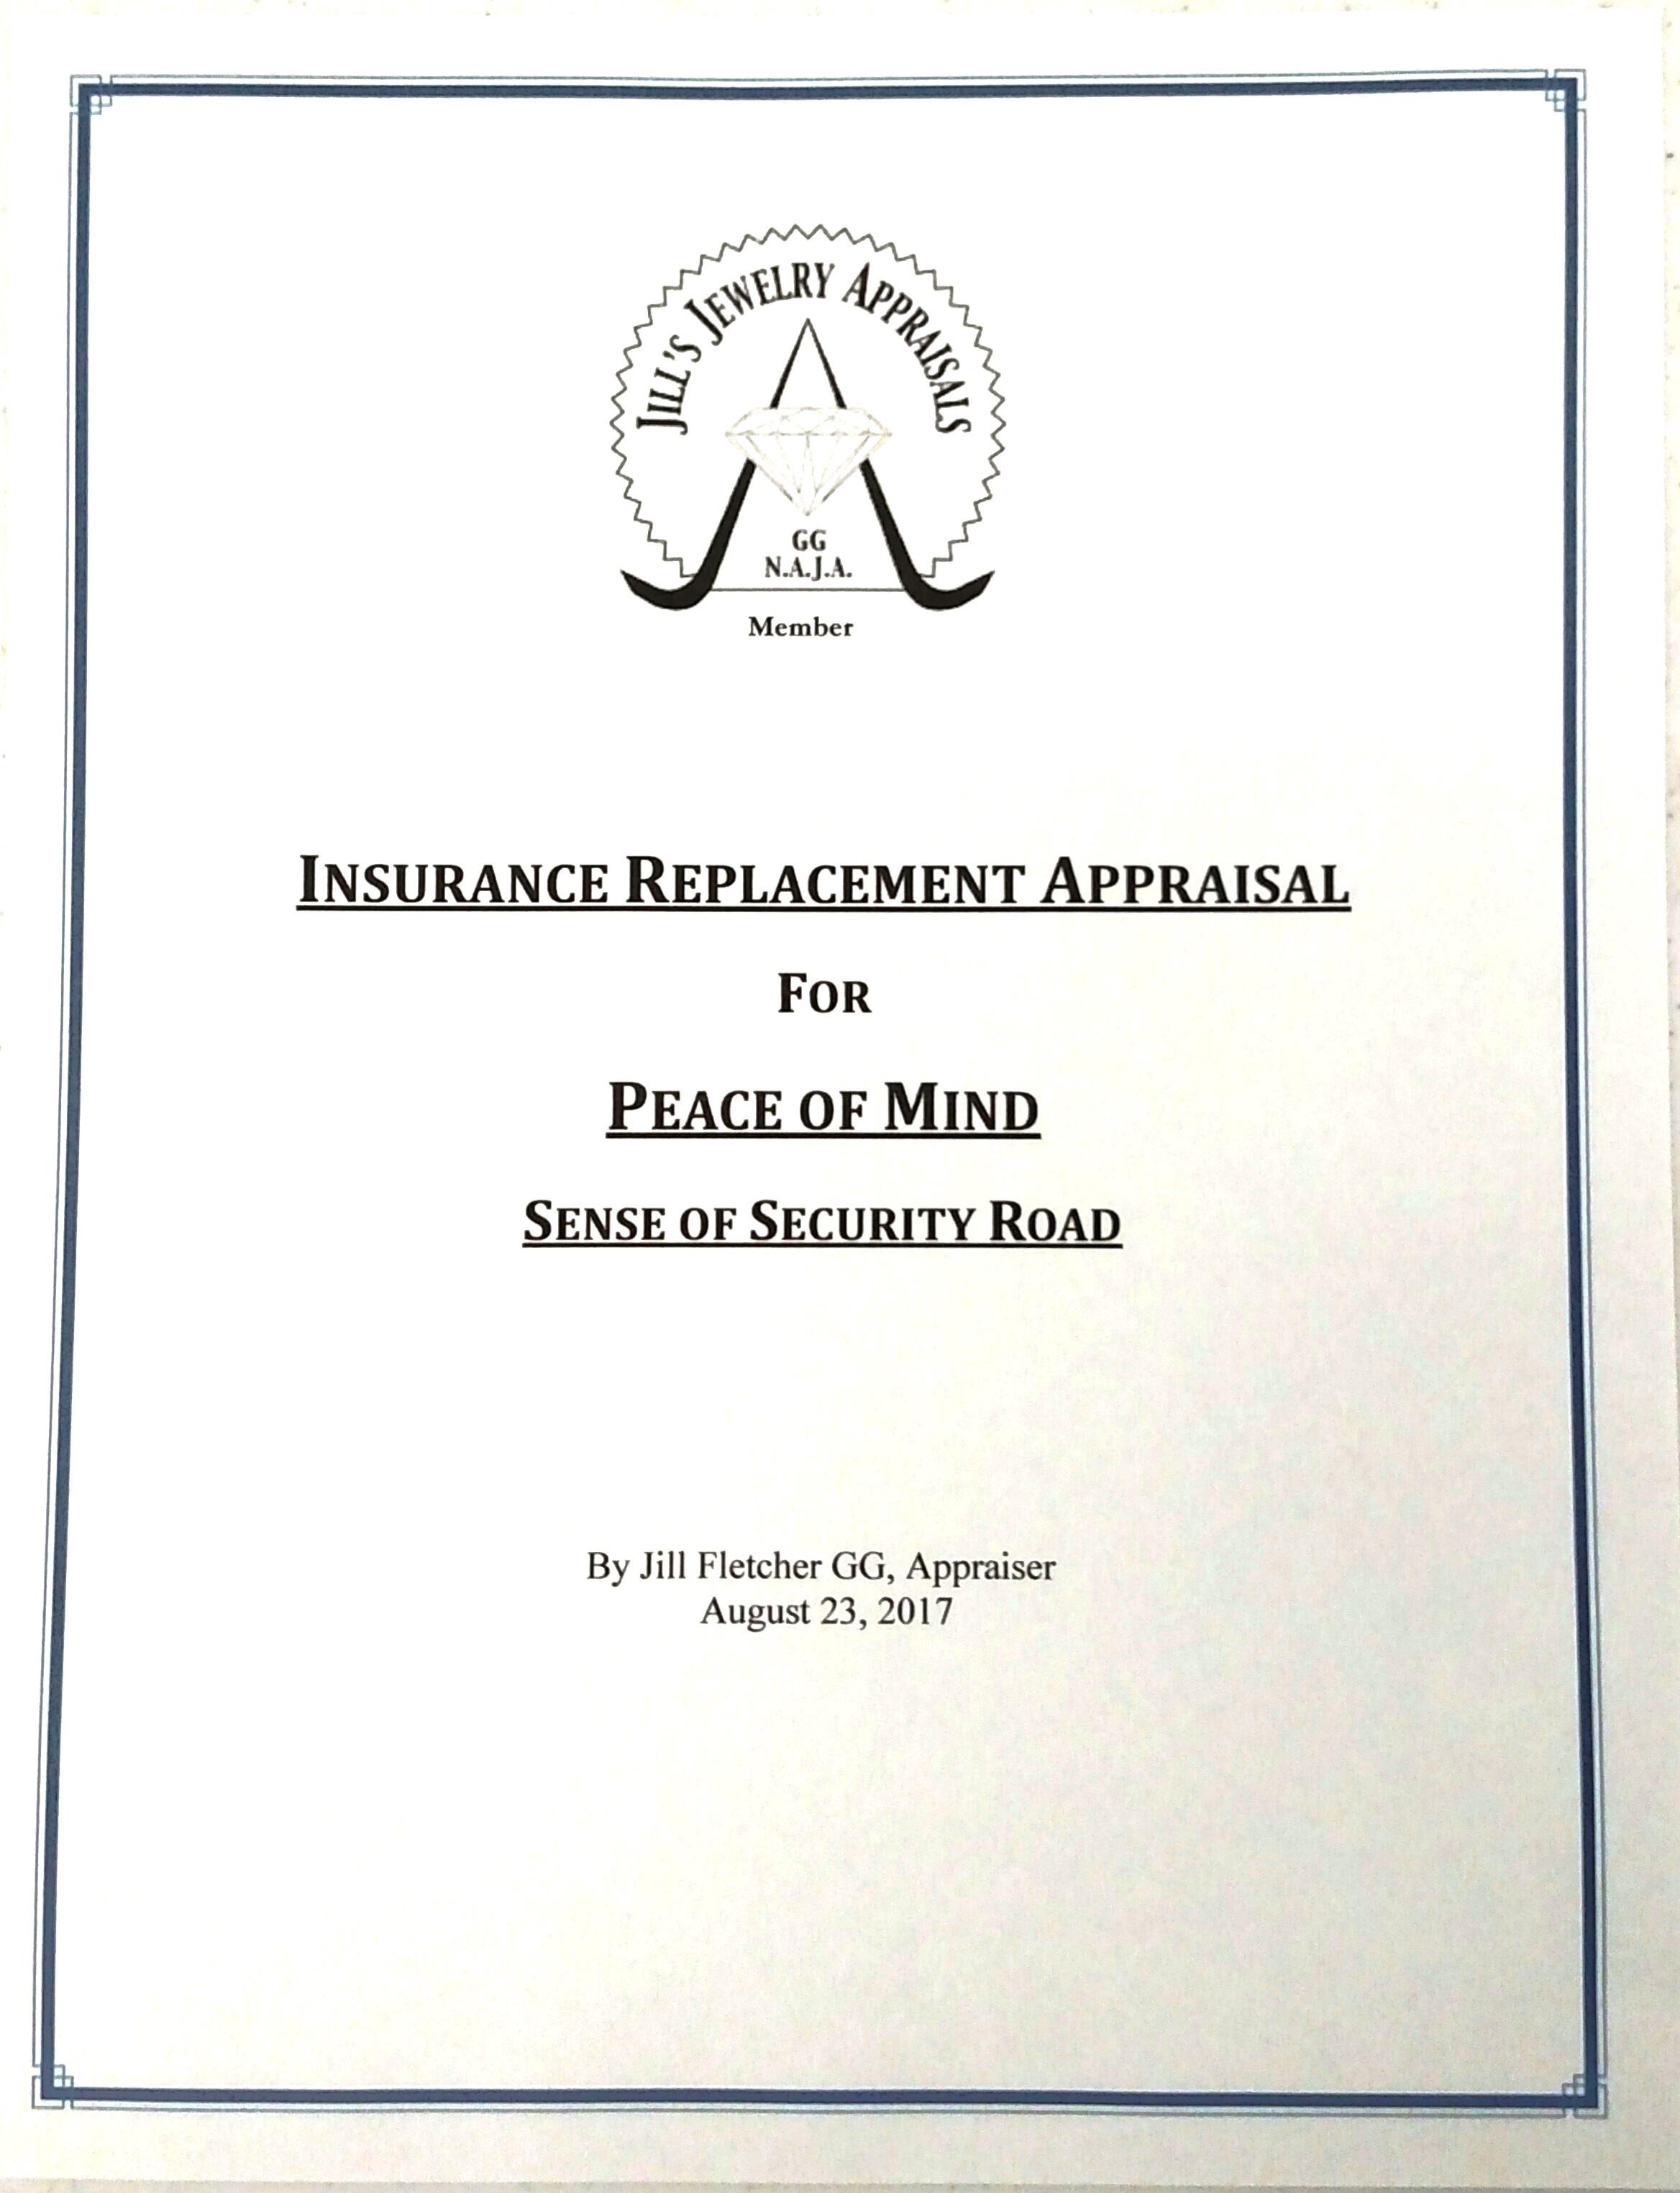 Insurance Replacement Appraisal